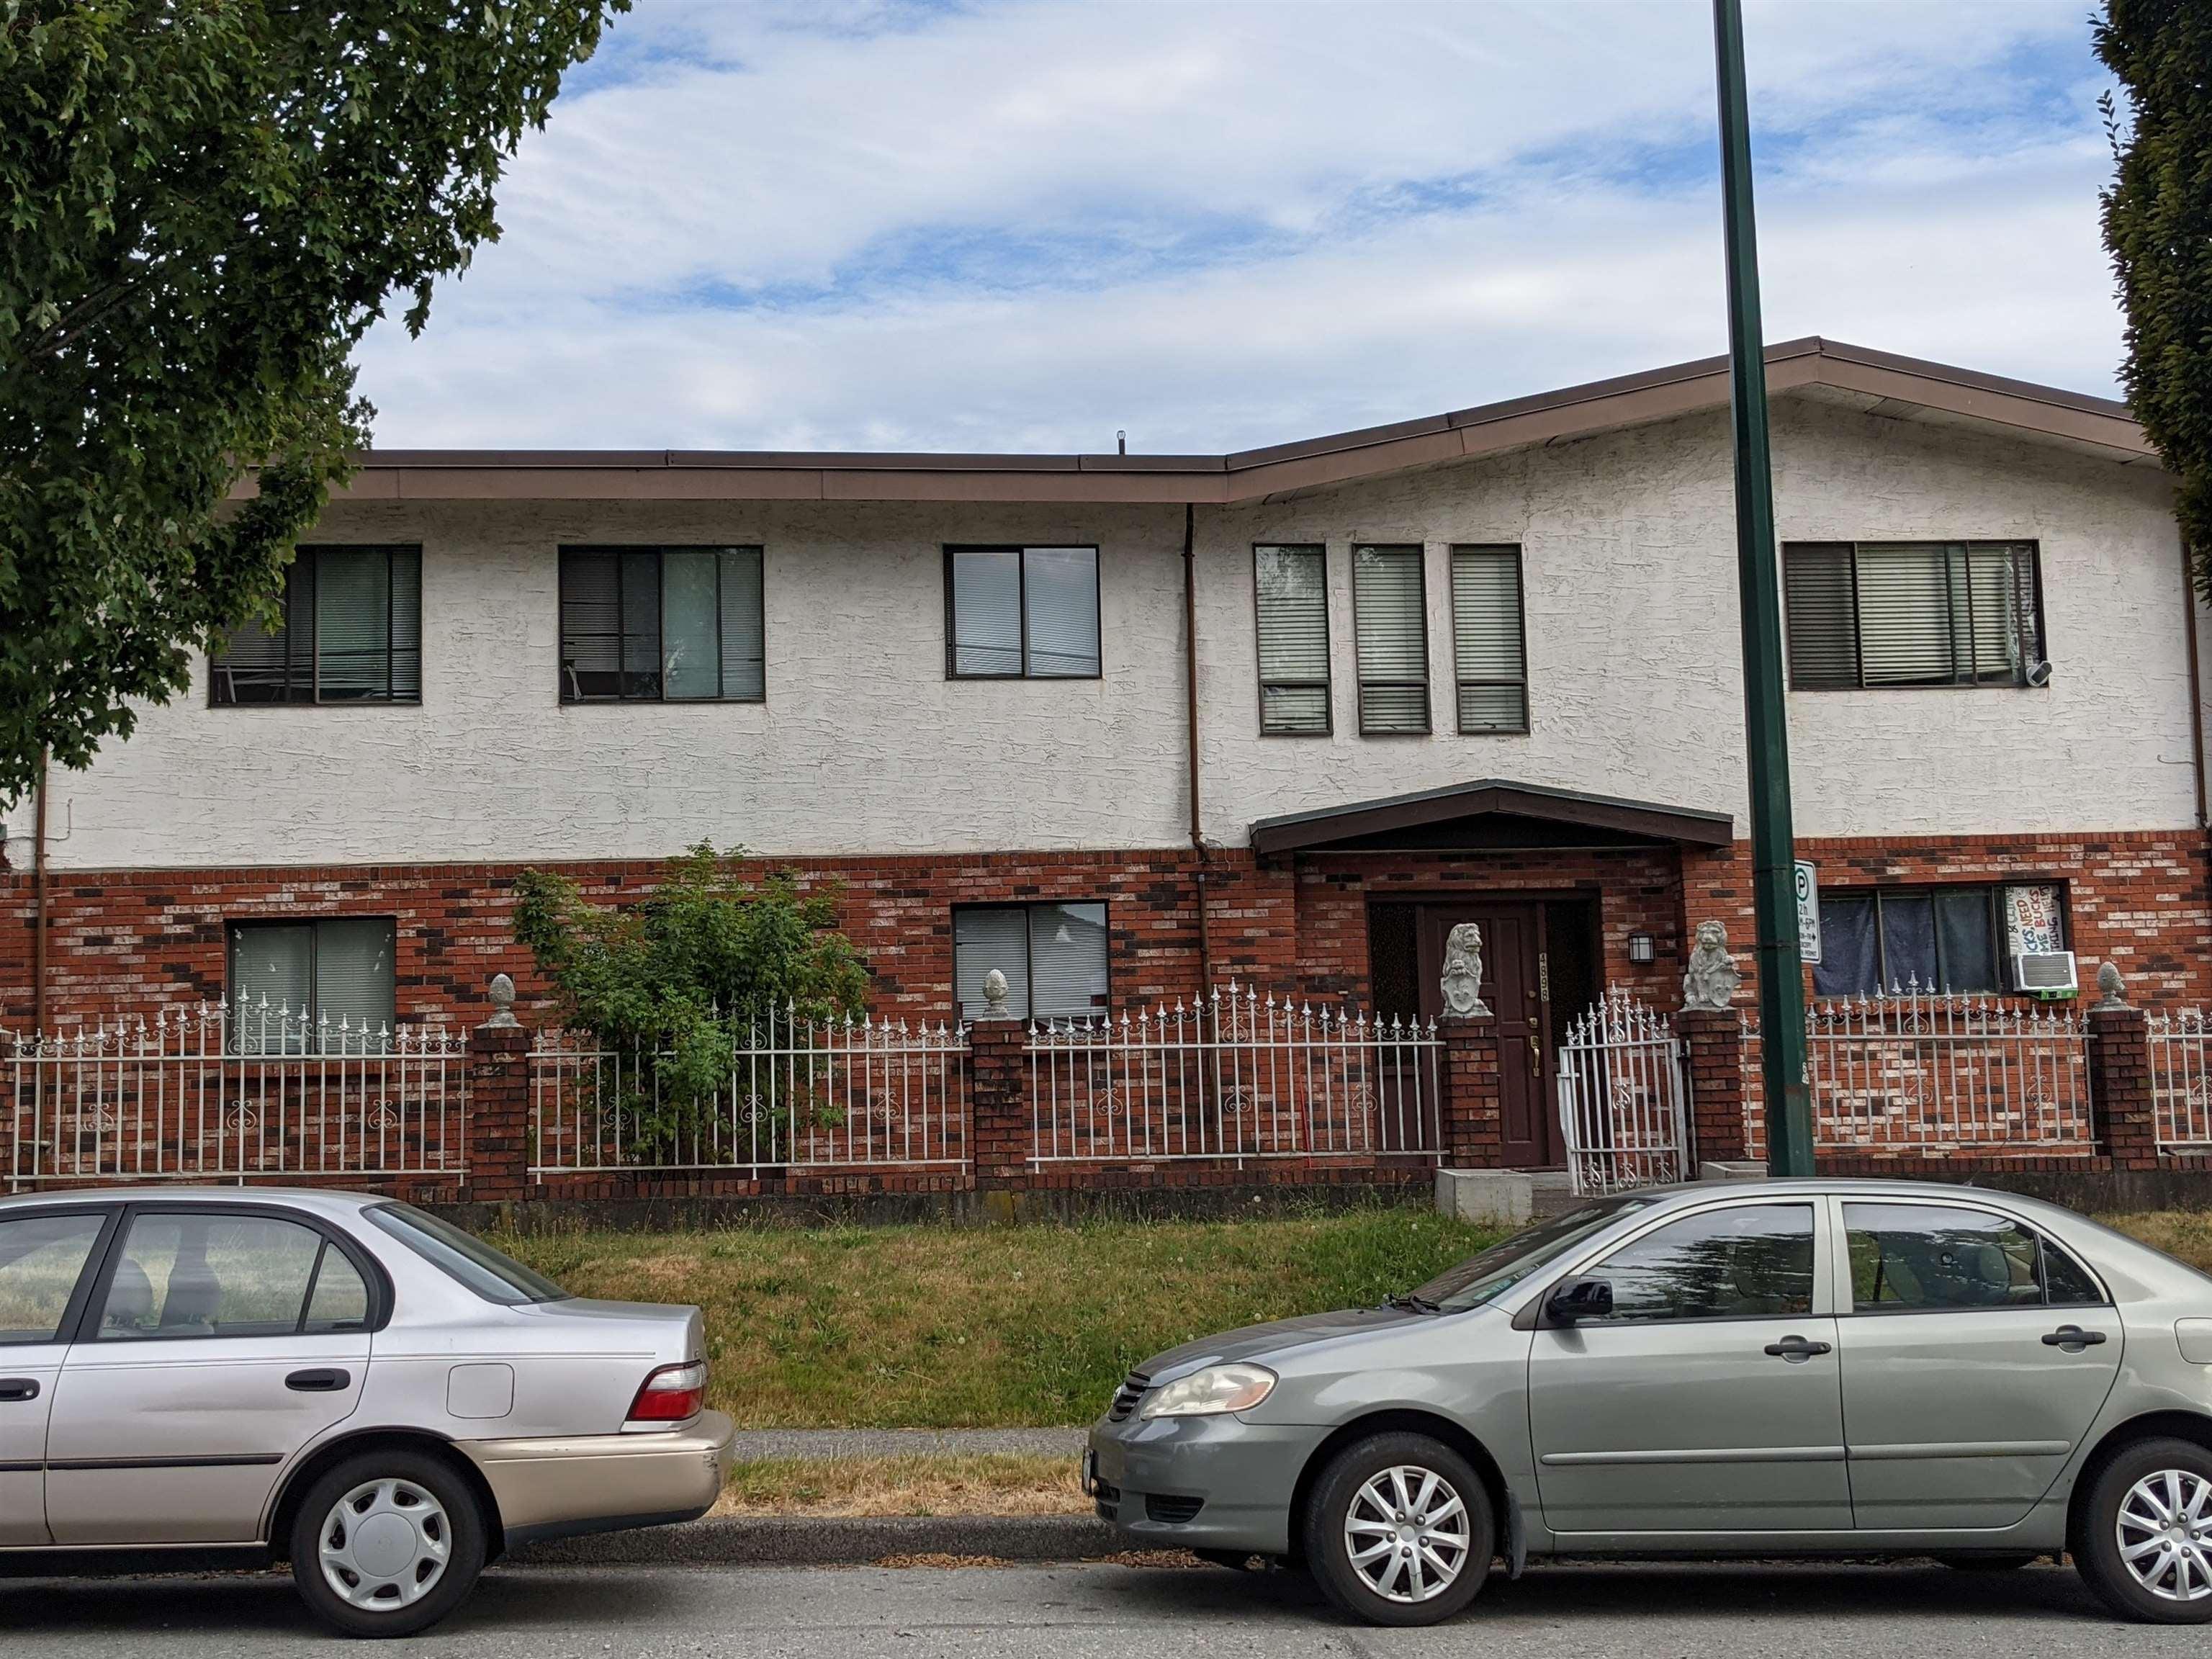 4898 JOYCE STREET - Collingwood VE House/Single Family for sale, 6 Bedrooms (R2611996) - #1